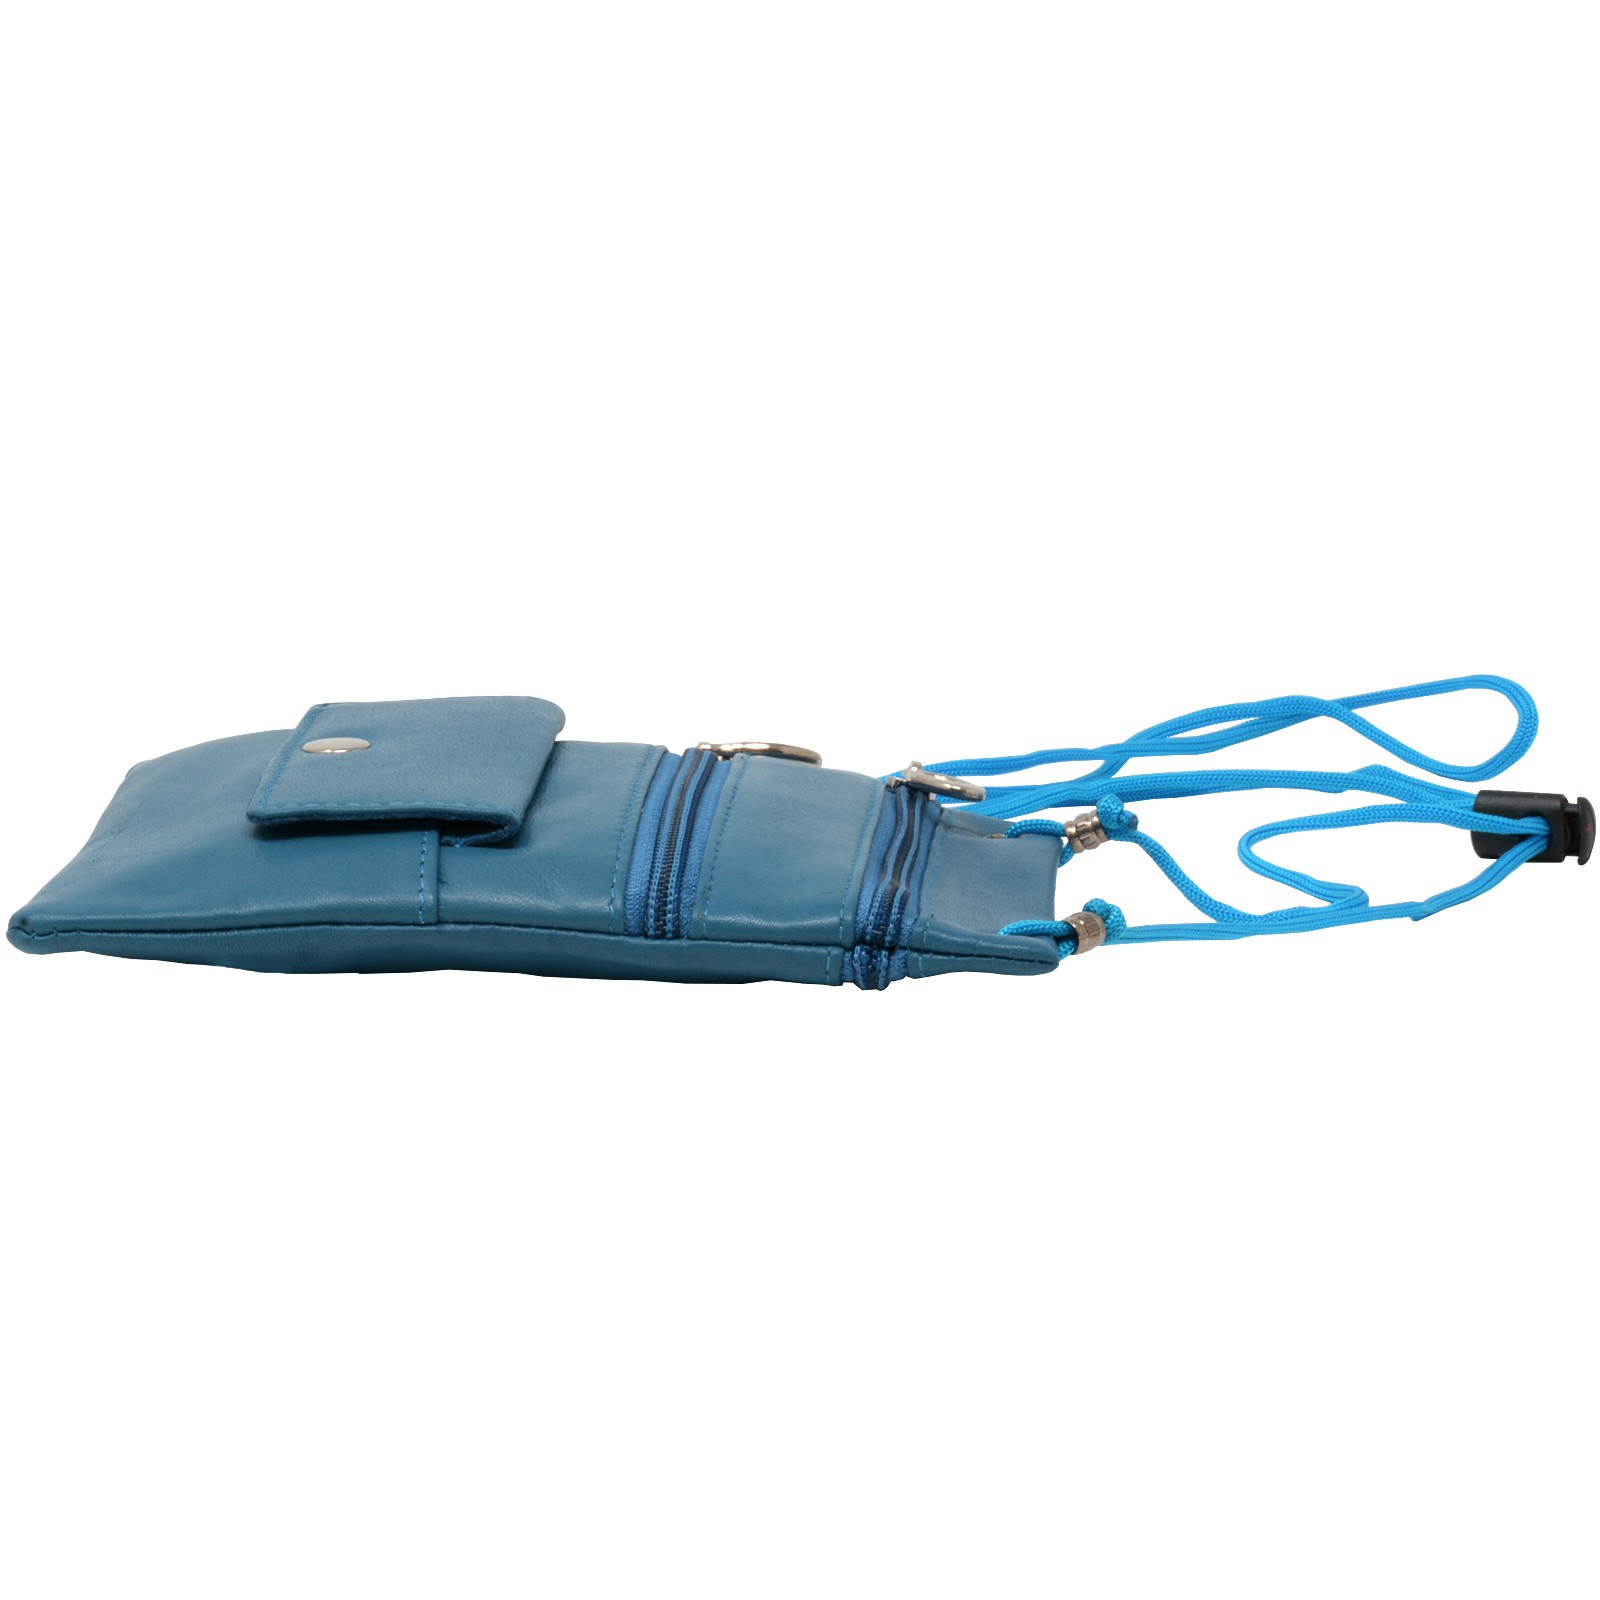 Soft-Leather-Purse-Organizer-Shoulder-Bag-4-Pocket-Micro-Handbag-Travel-Wallet thumbnail 25